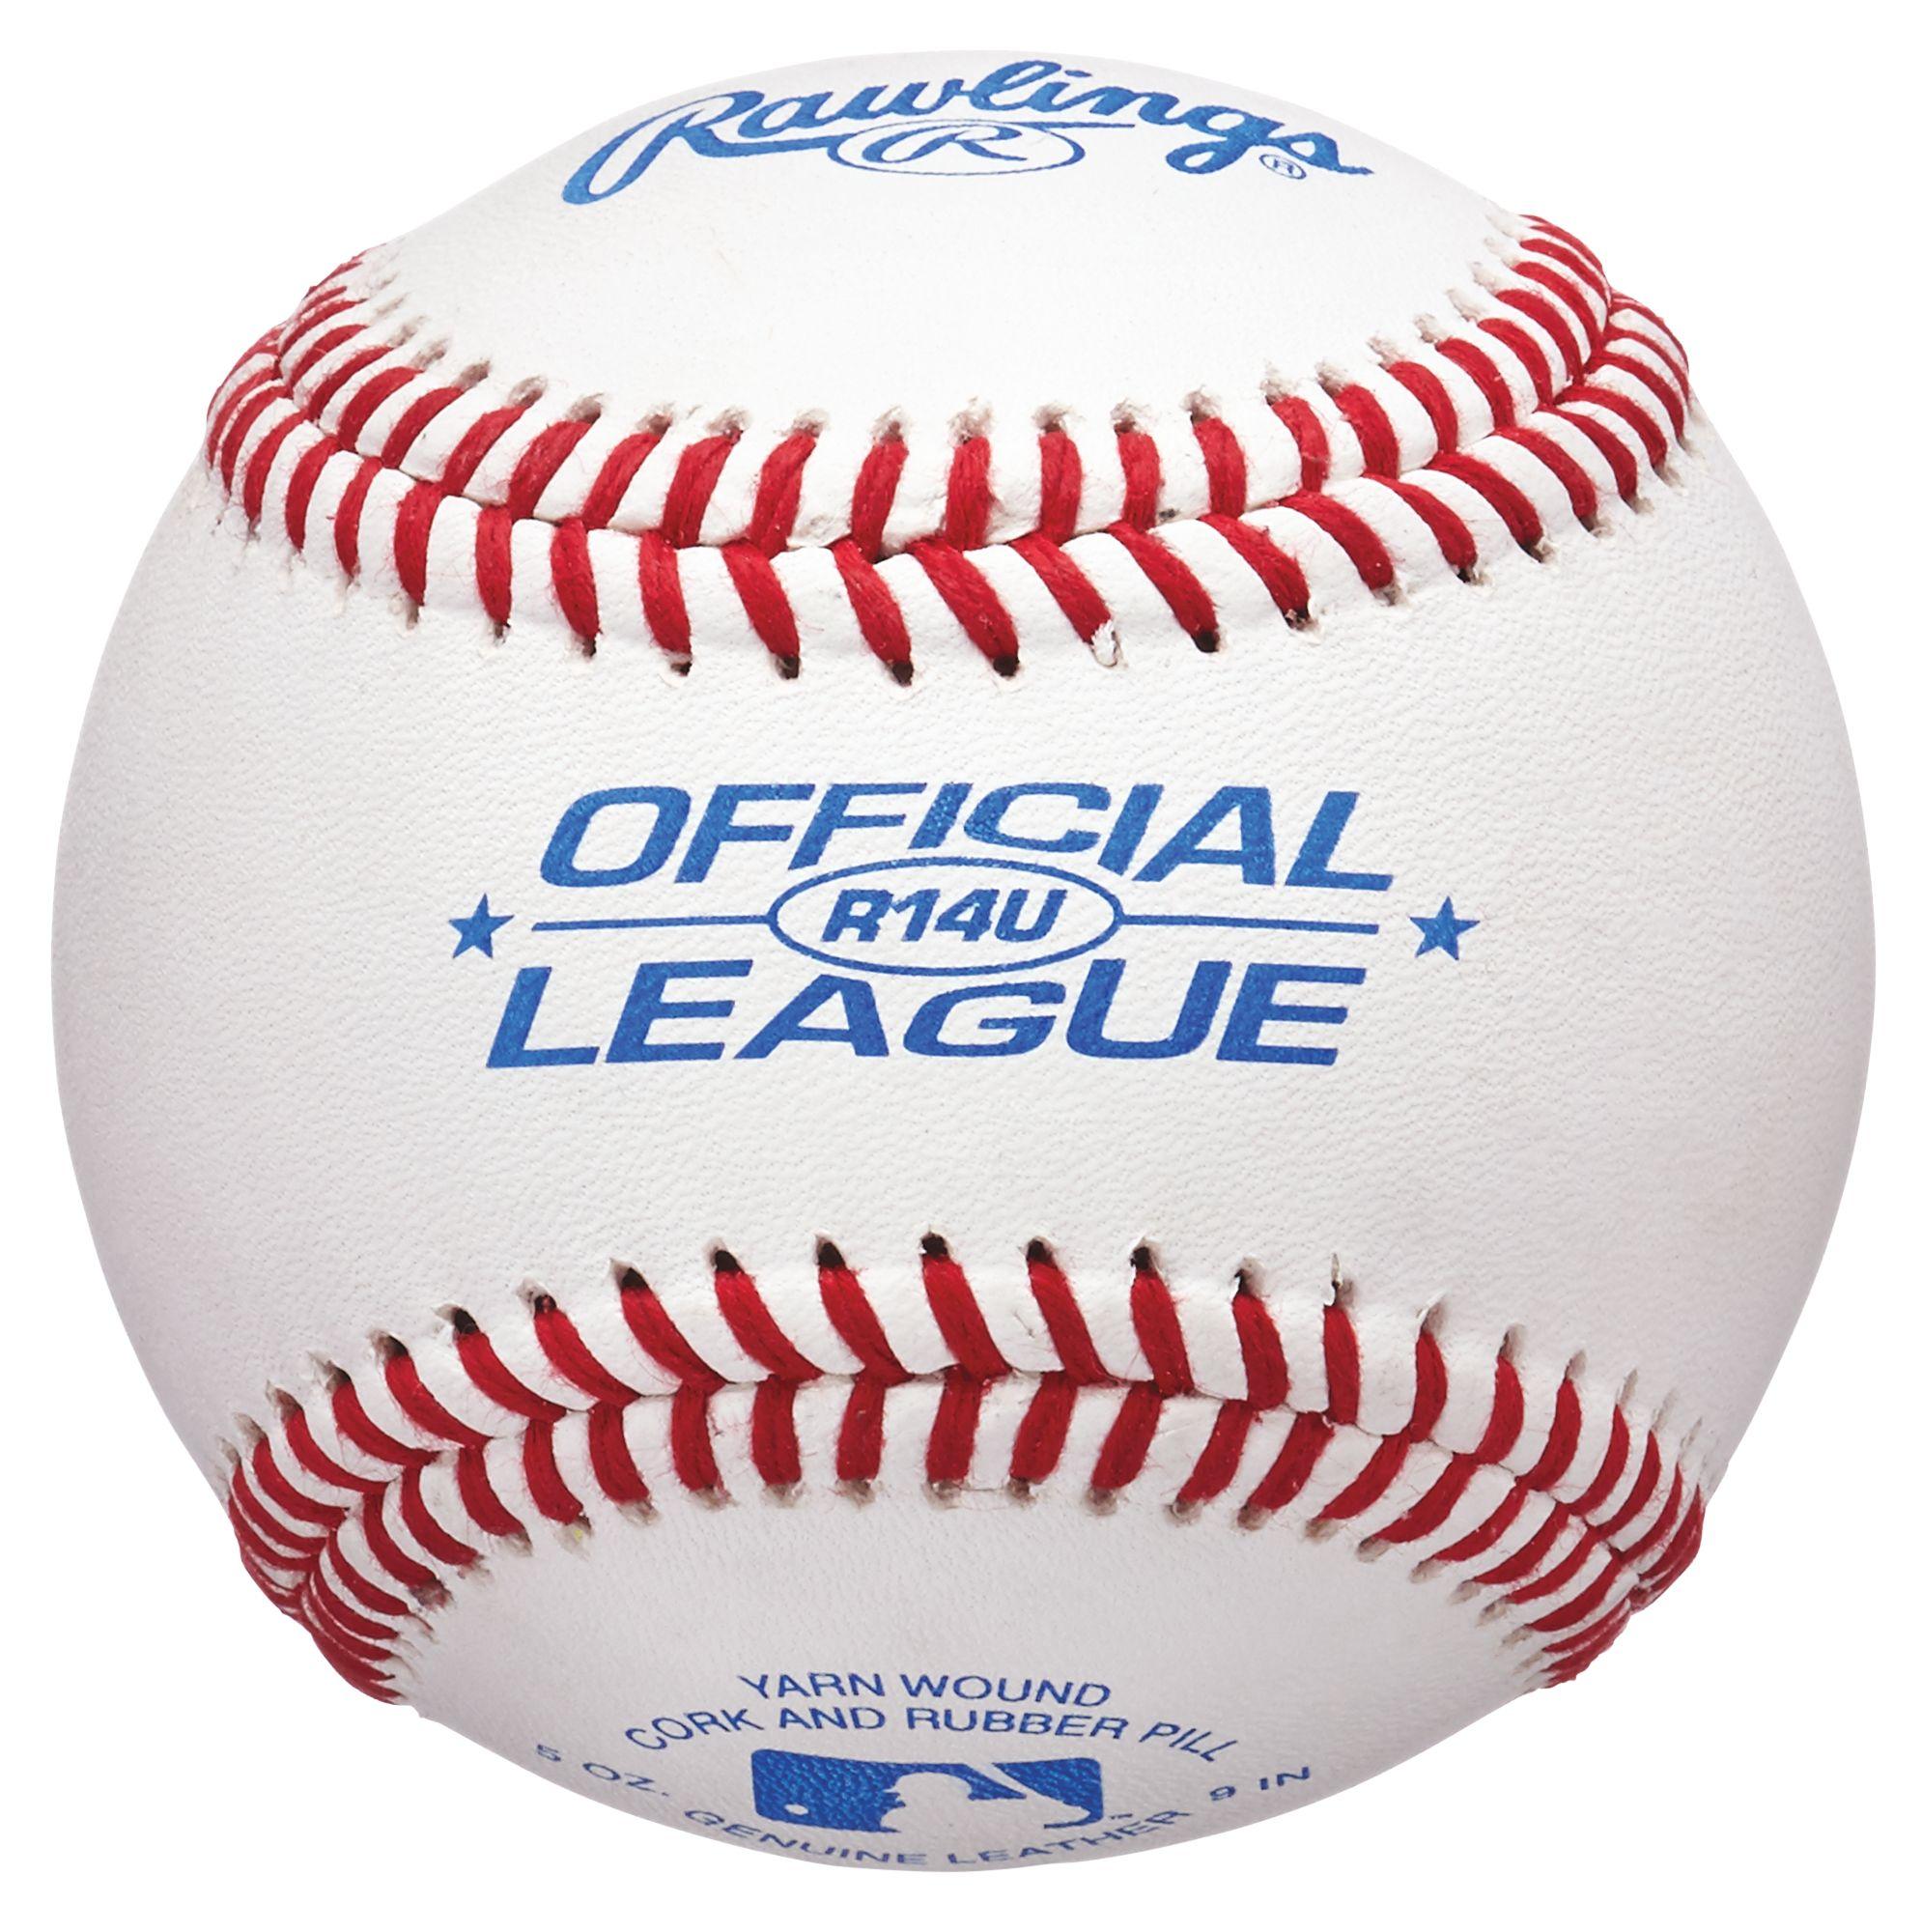 ROLB1 Box of 12 Official Junior League Competition Grade Baseballs Rawlings Raised Seam Baseballs Cover